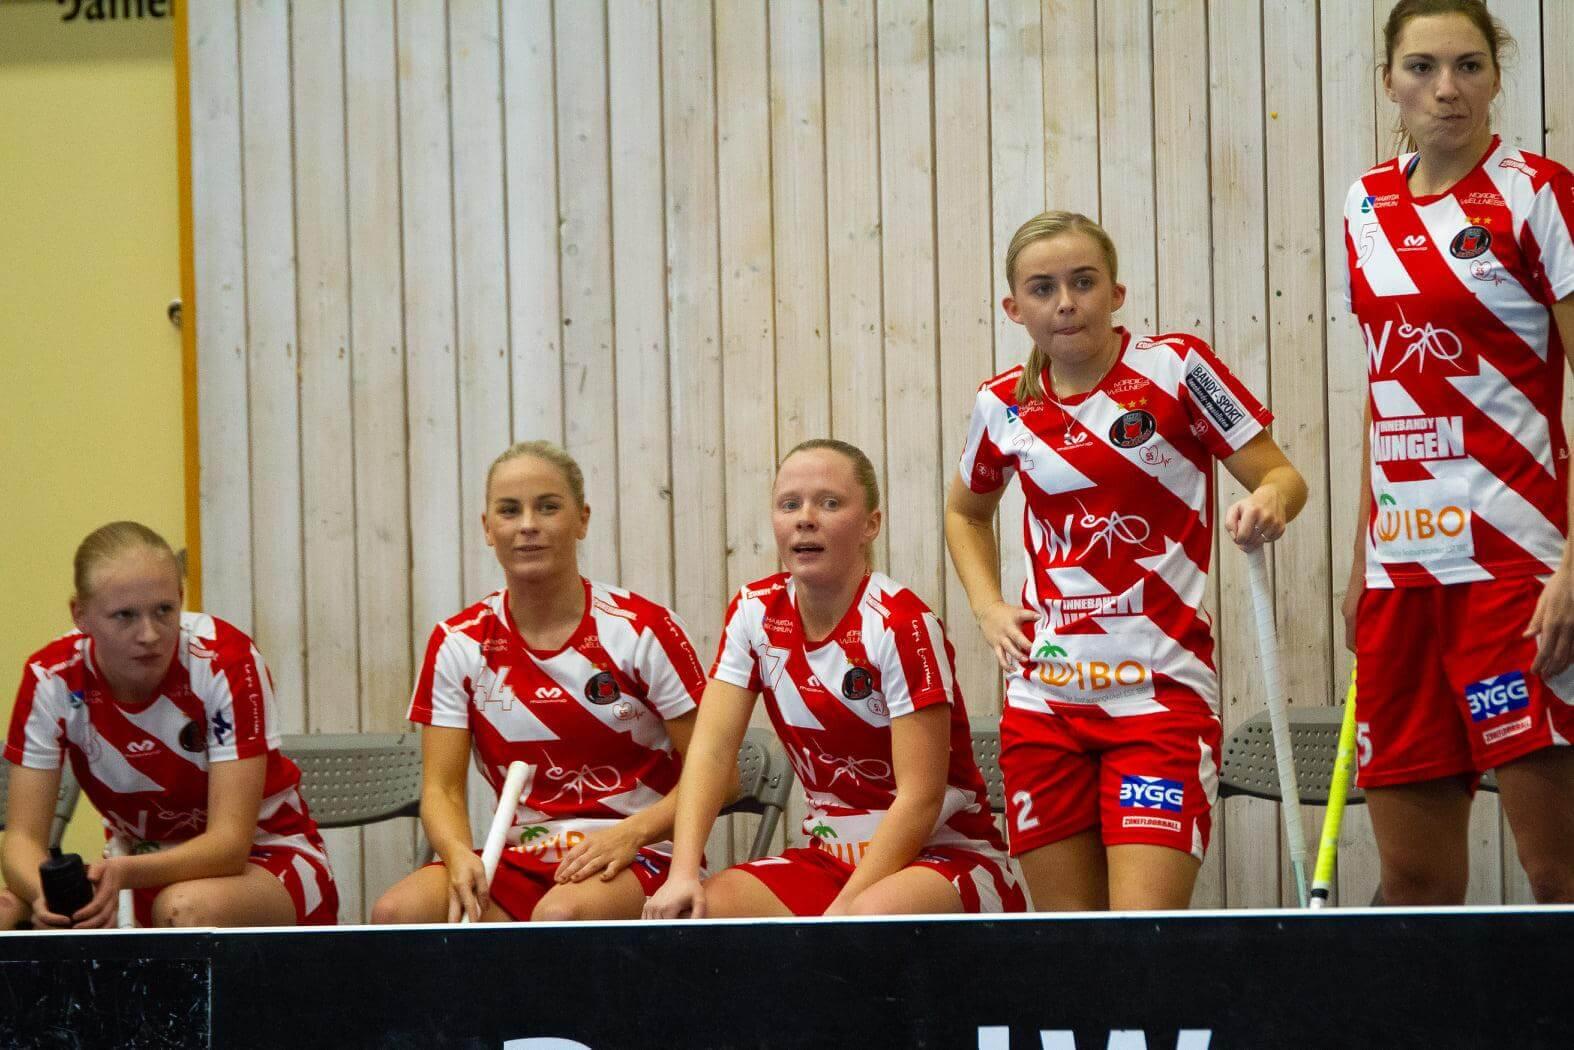 Pixbo får ny hovedtrener etter at klubben valgte å sparke Jonas Eliasson. Foto: A.Kårhag